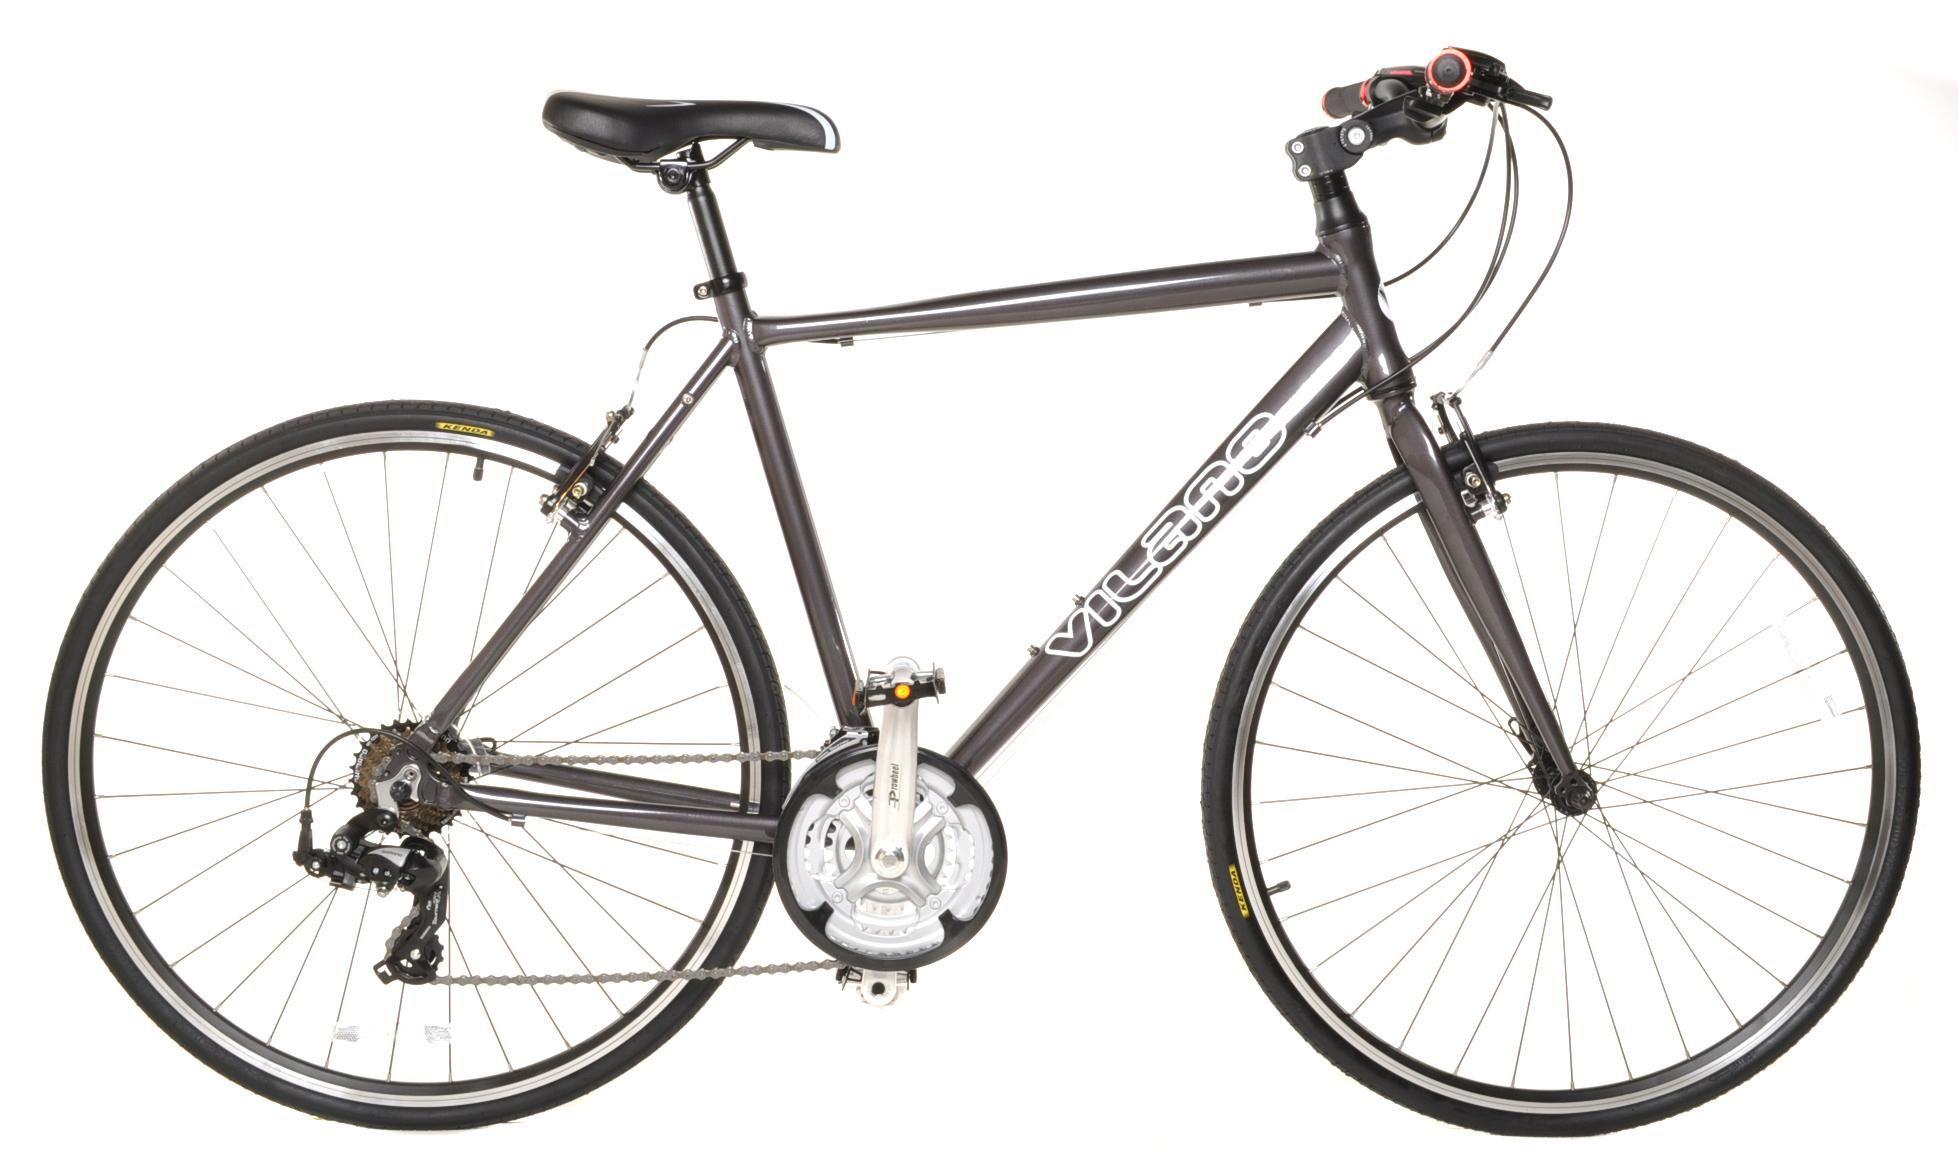 Vilano Performance Hybrid Bike 700c 21 Speed Shimano Road Bike